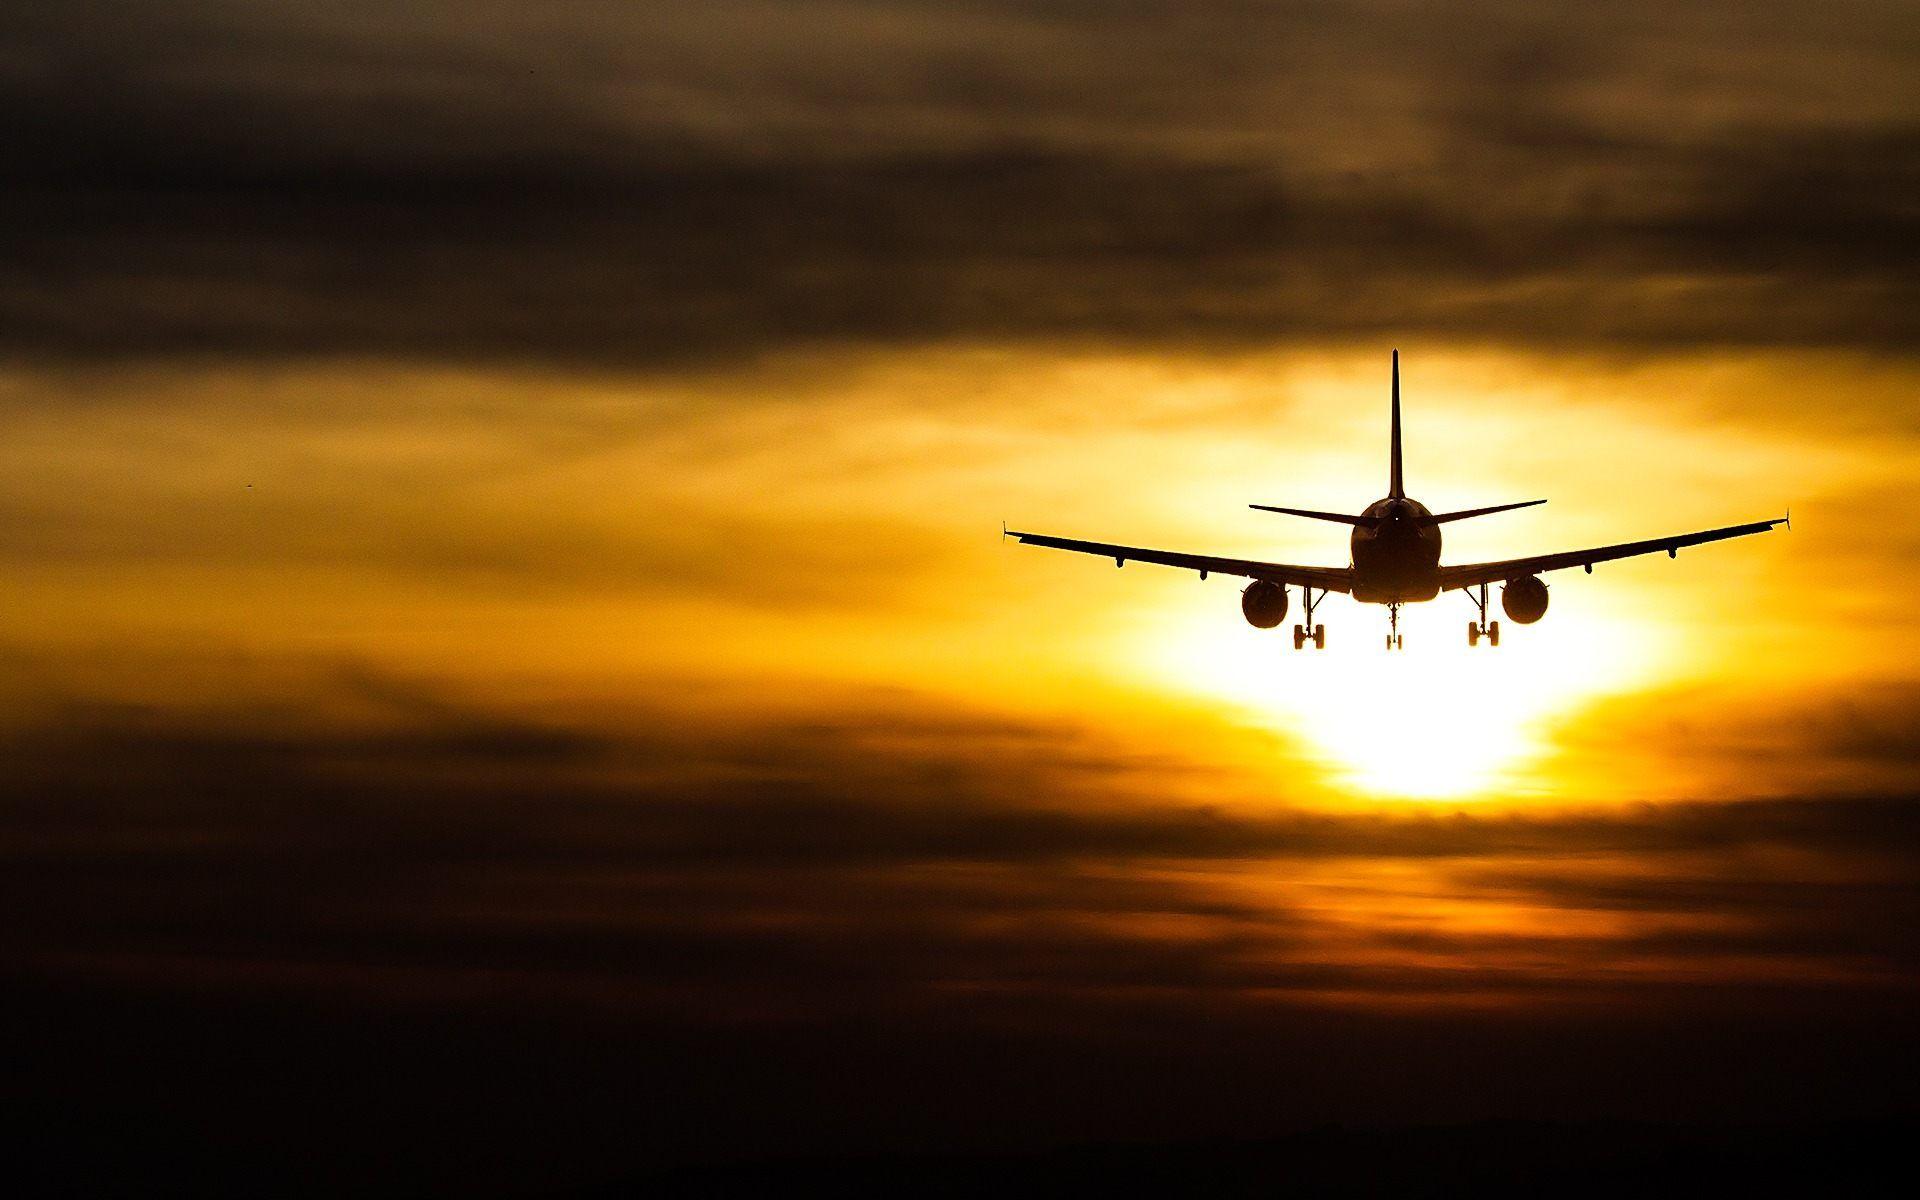 Plane Sky Altitude Flight HD desktop wallpaper Widescreen